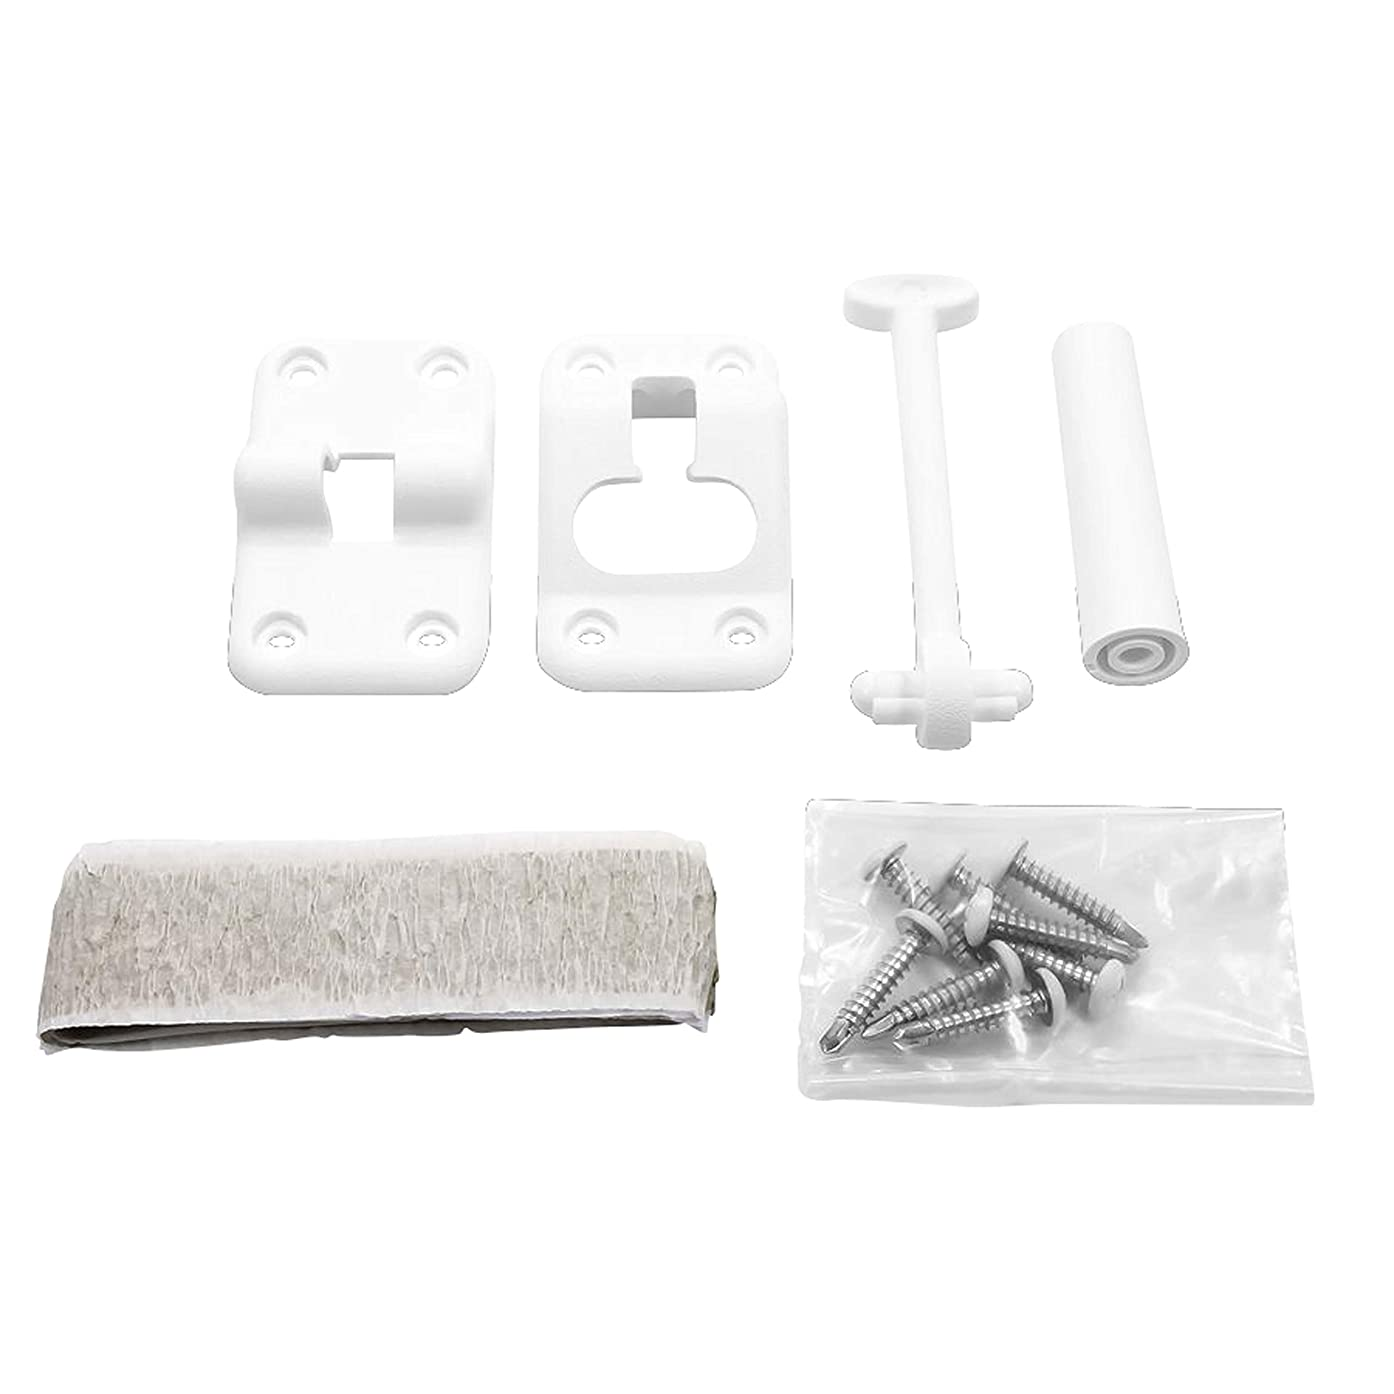 Camco Mfg 42383 Door Holder Kit 3.5